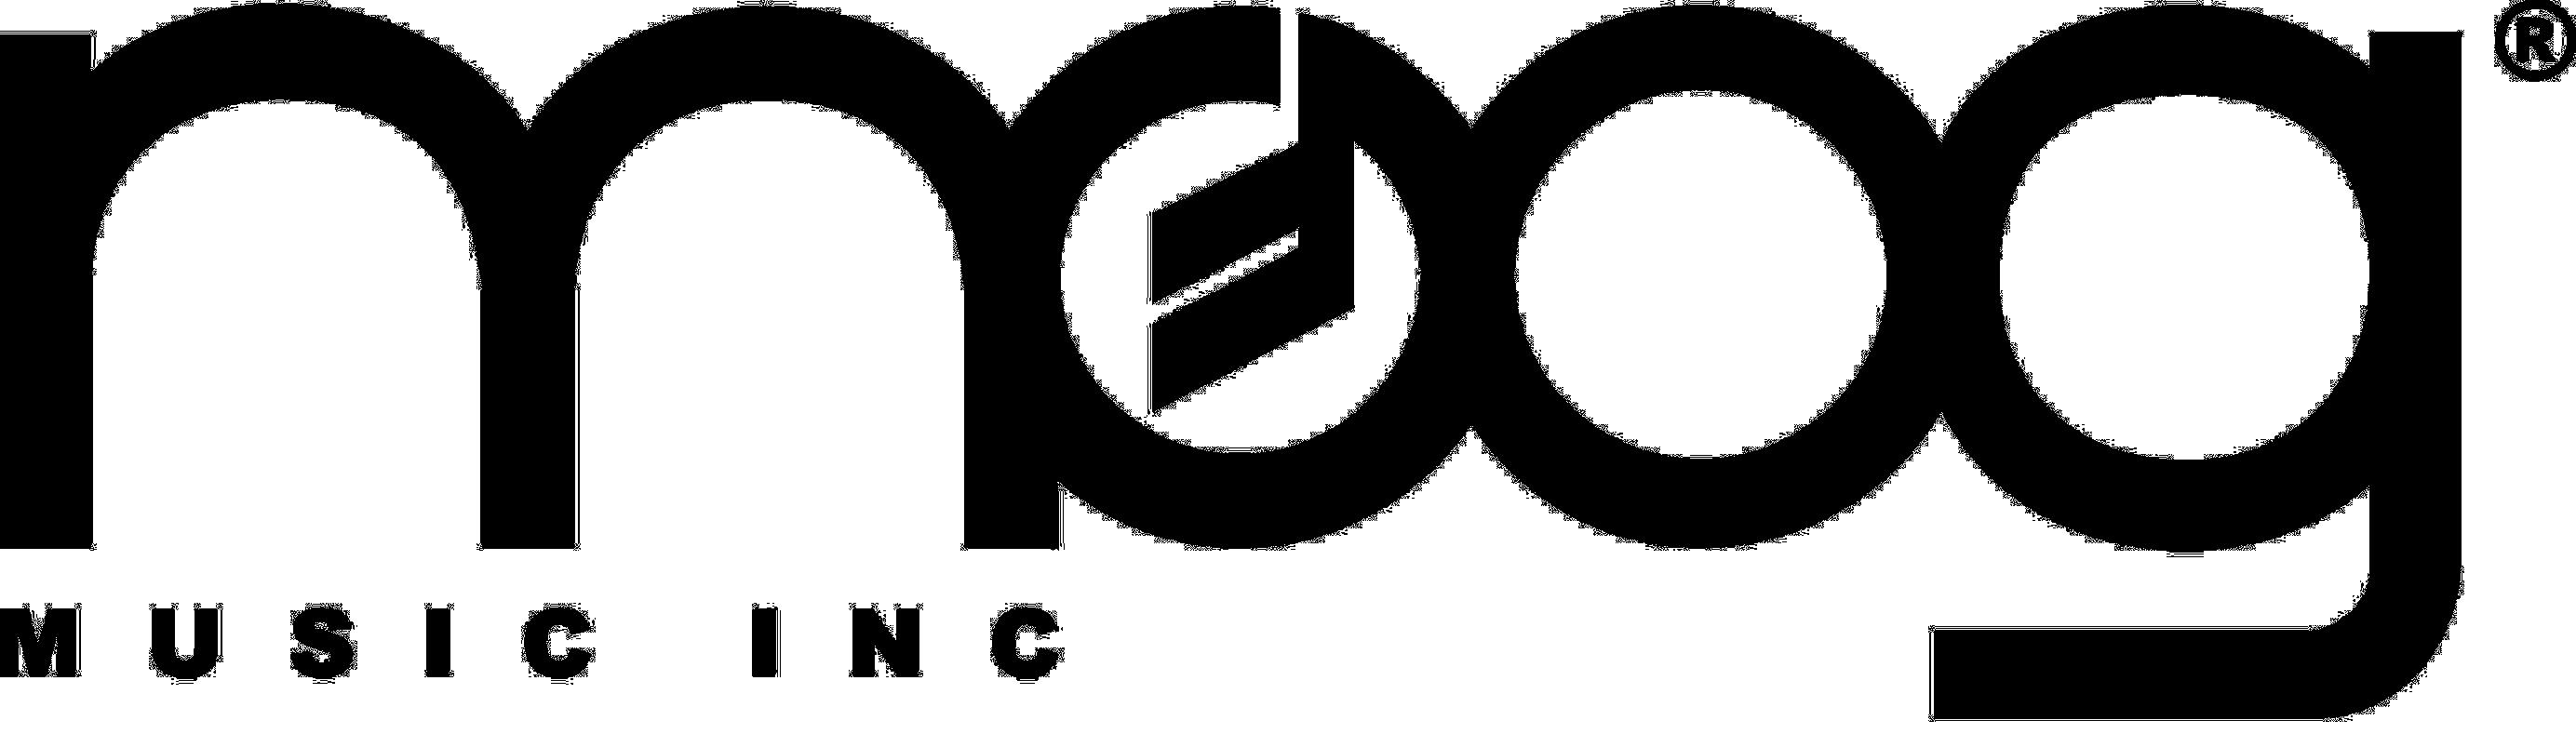 moog music logo png #2352